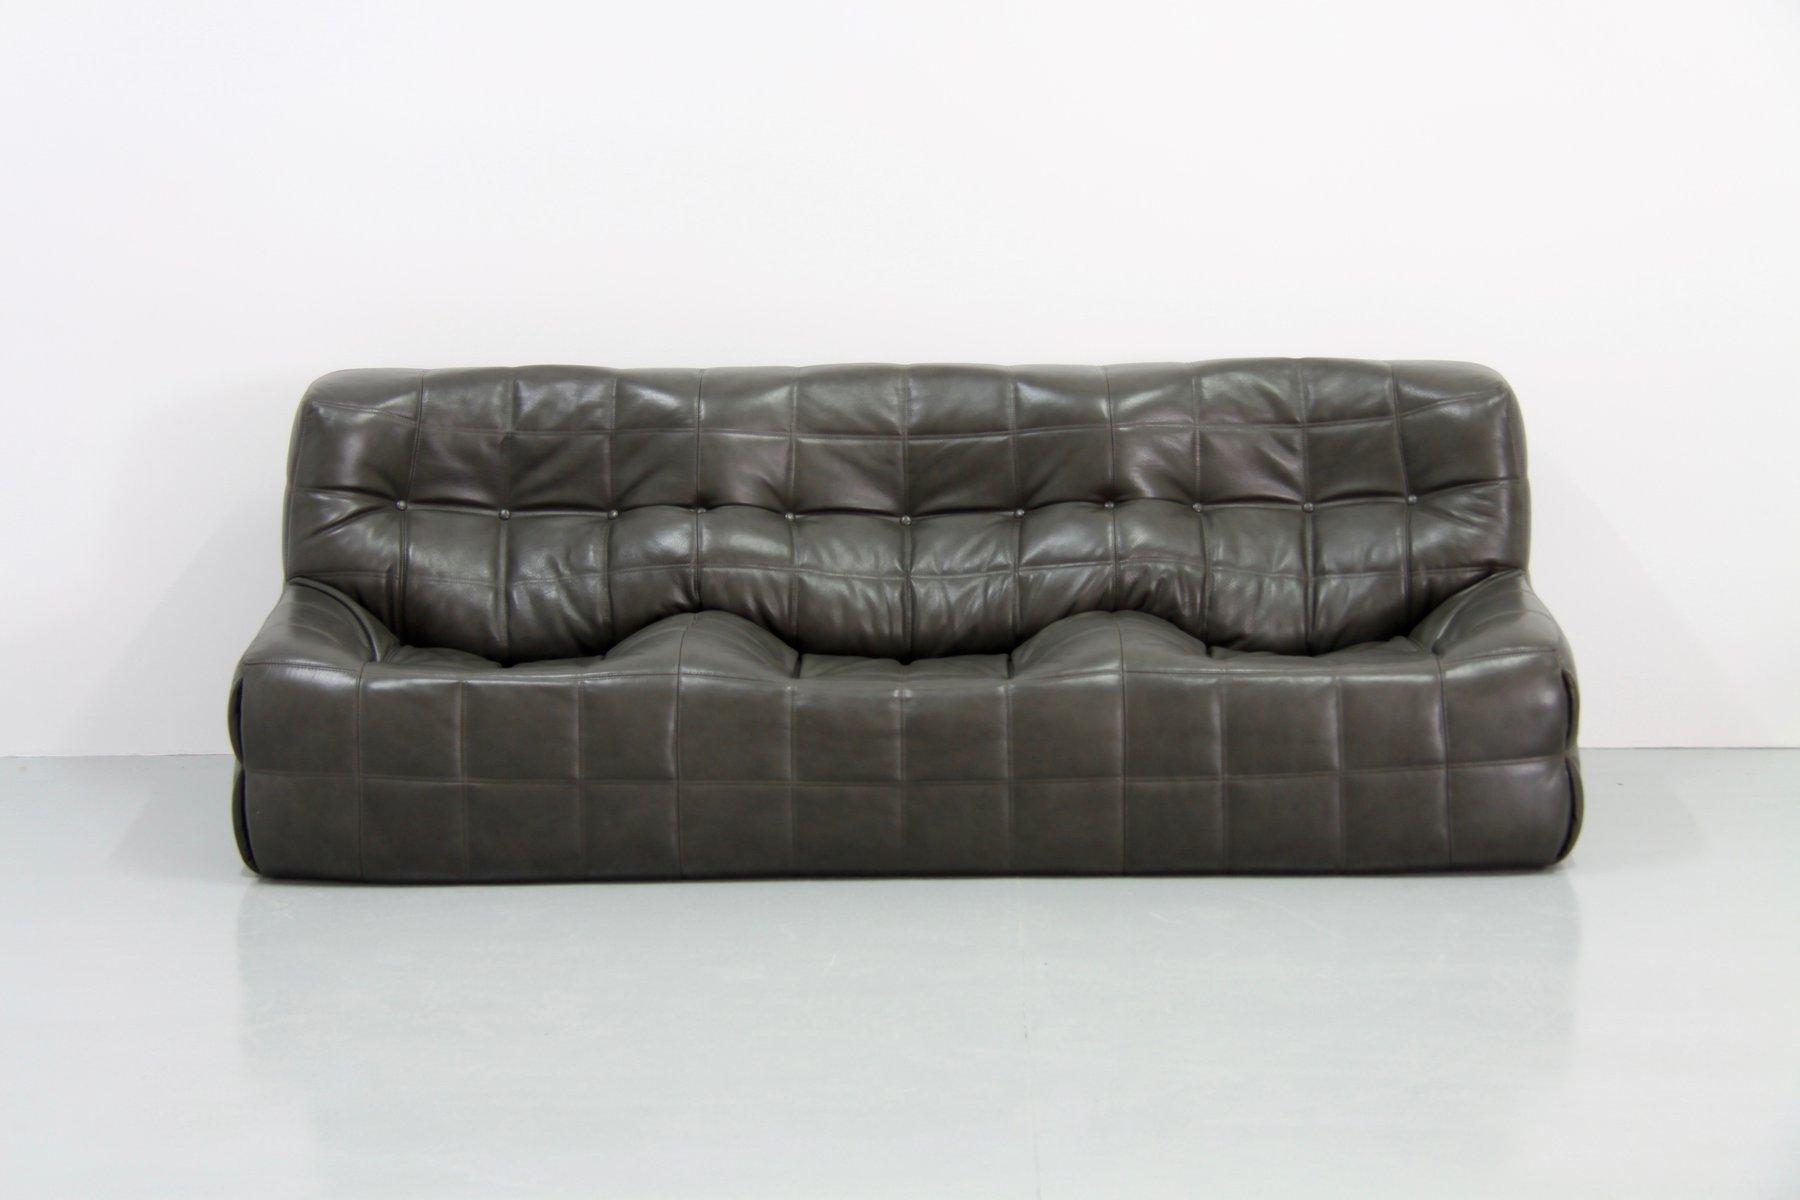 salon ligne roset awesome great meuble salon ligne roset lyon with salon gris et vert anis with. Black Bedroom Furniture Sets. Home Design Ideas